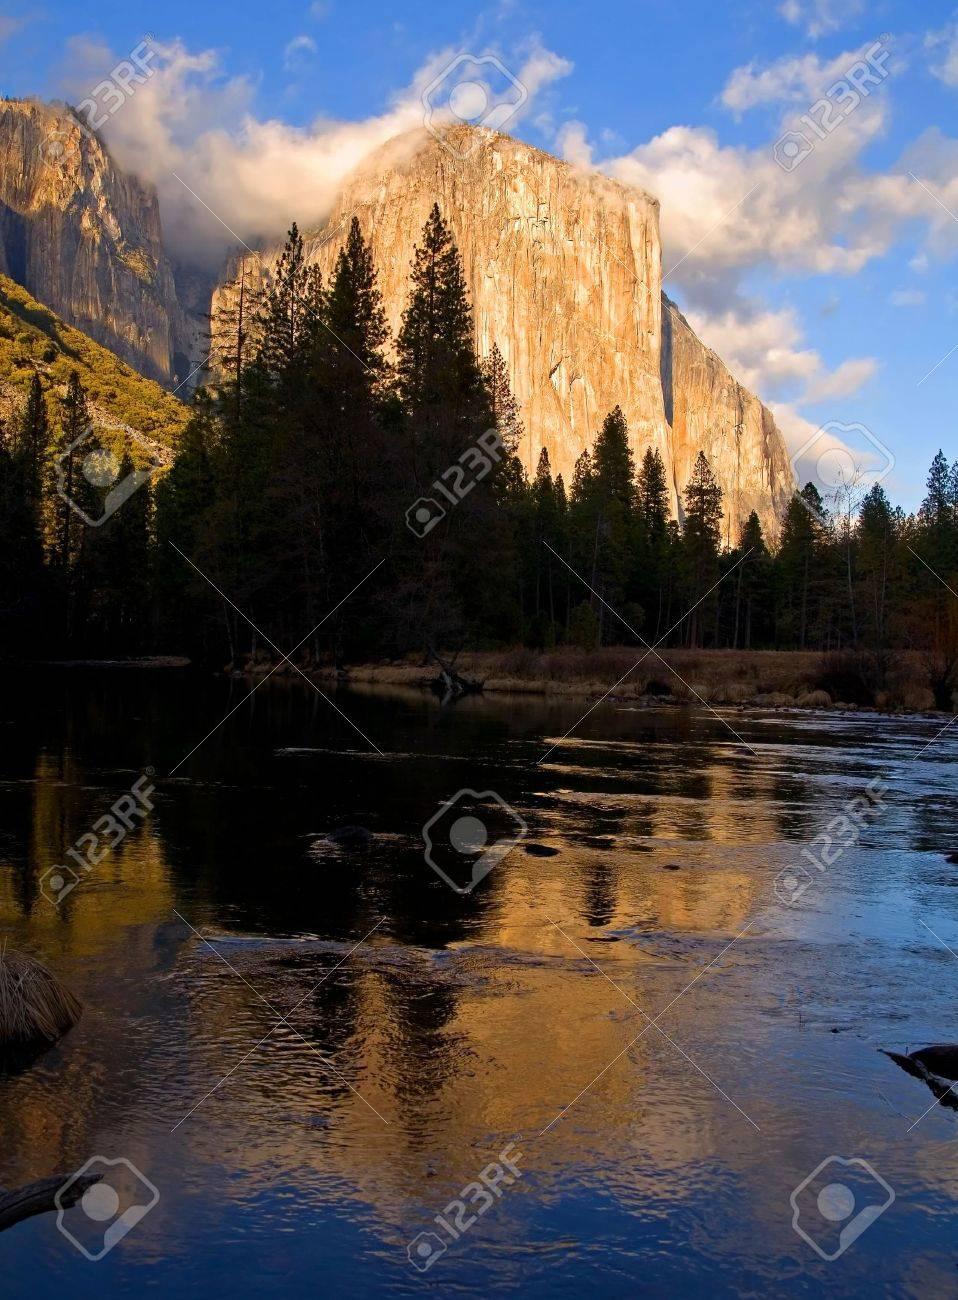 Reflection of El Capitan in Yosemite at sunset Stock Photo - 6173096